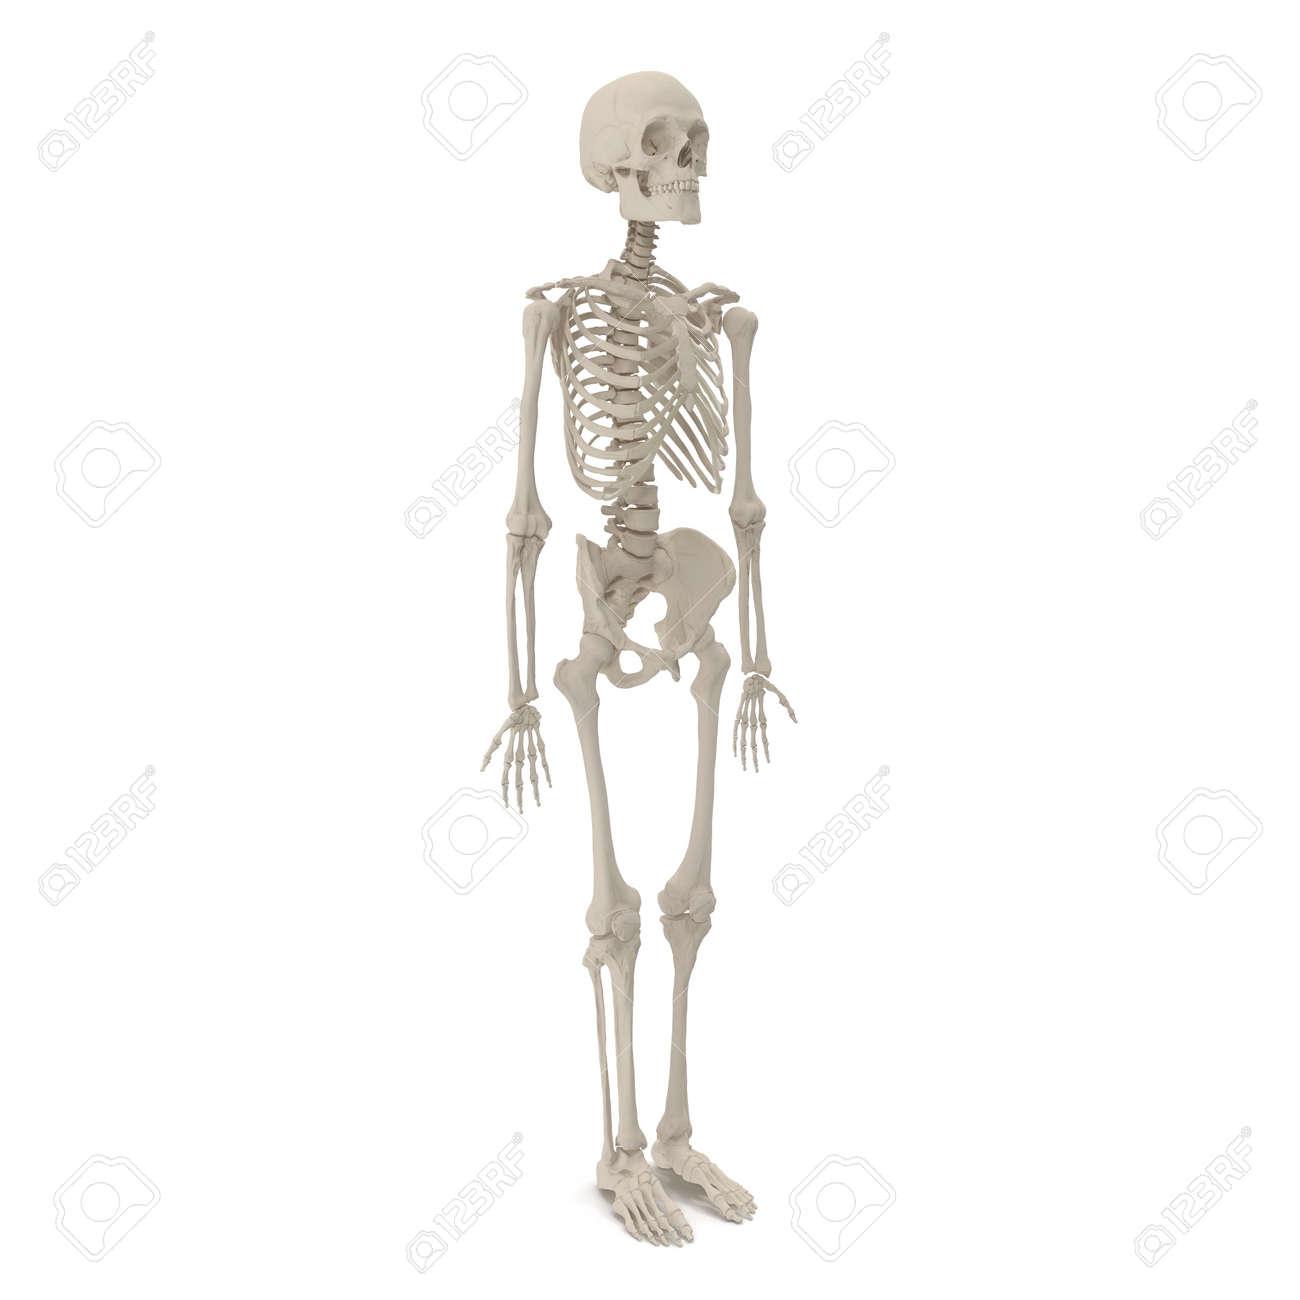 Human Male Skeleton Standing Pose On White 3d Illustration Stock